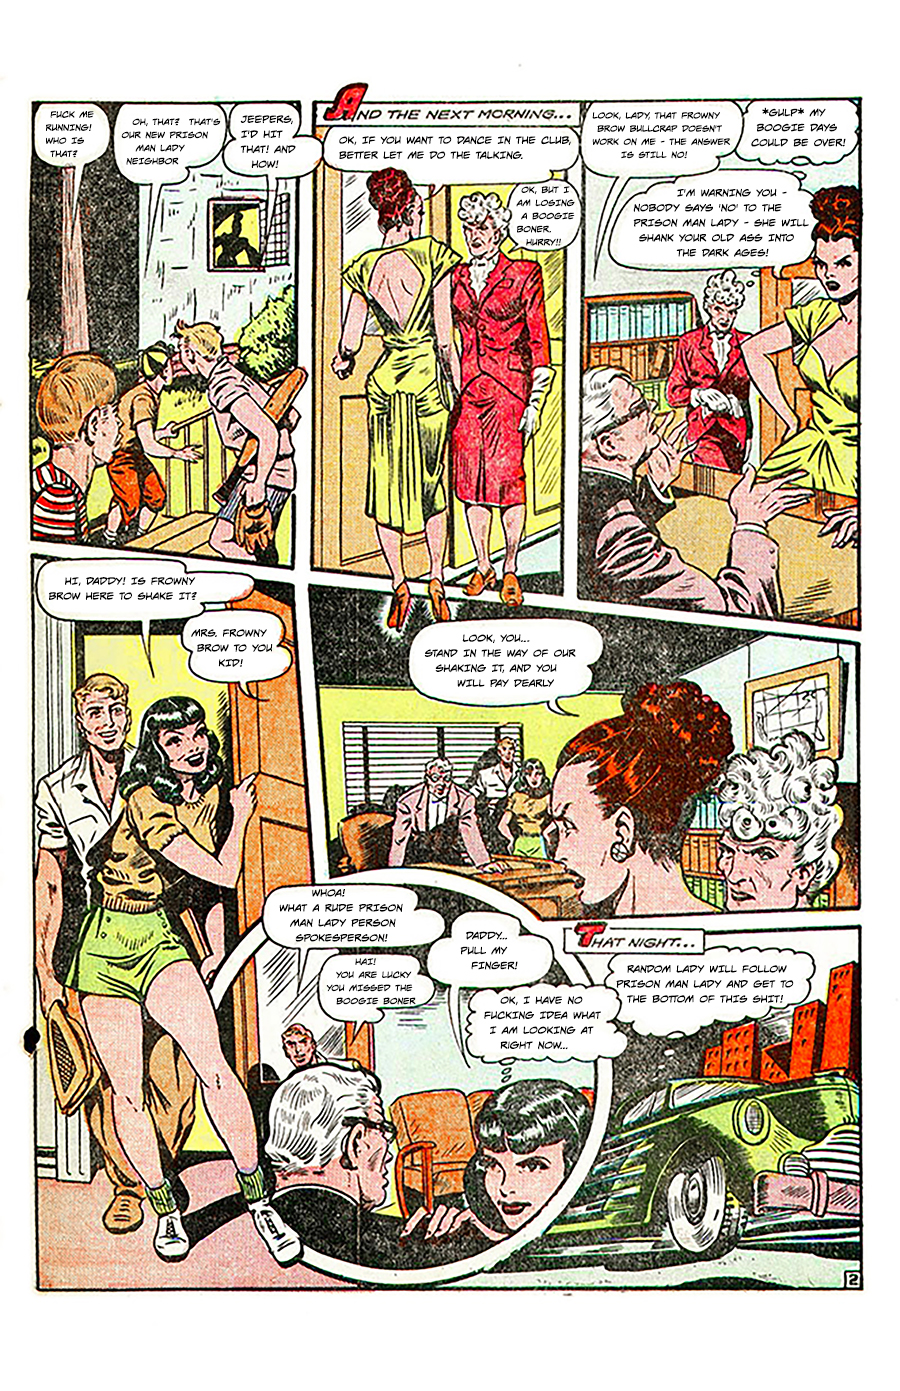 Random Lady – Prison-man-lady Page 2